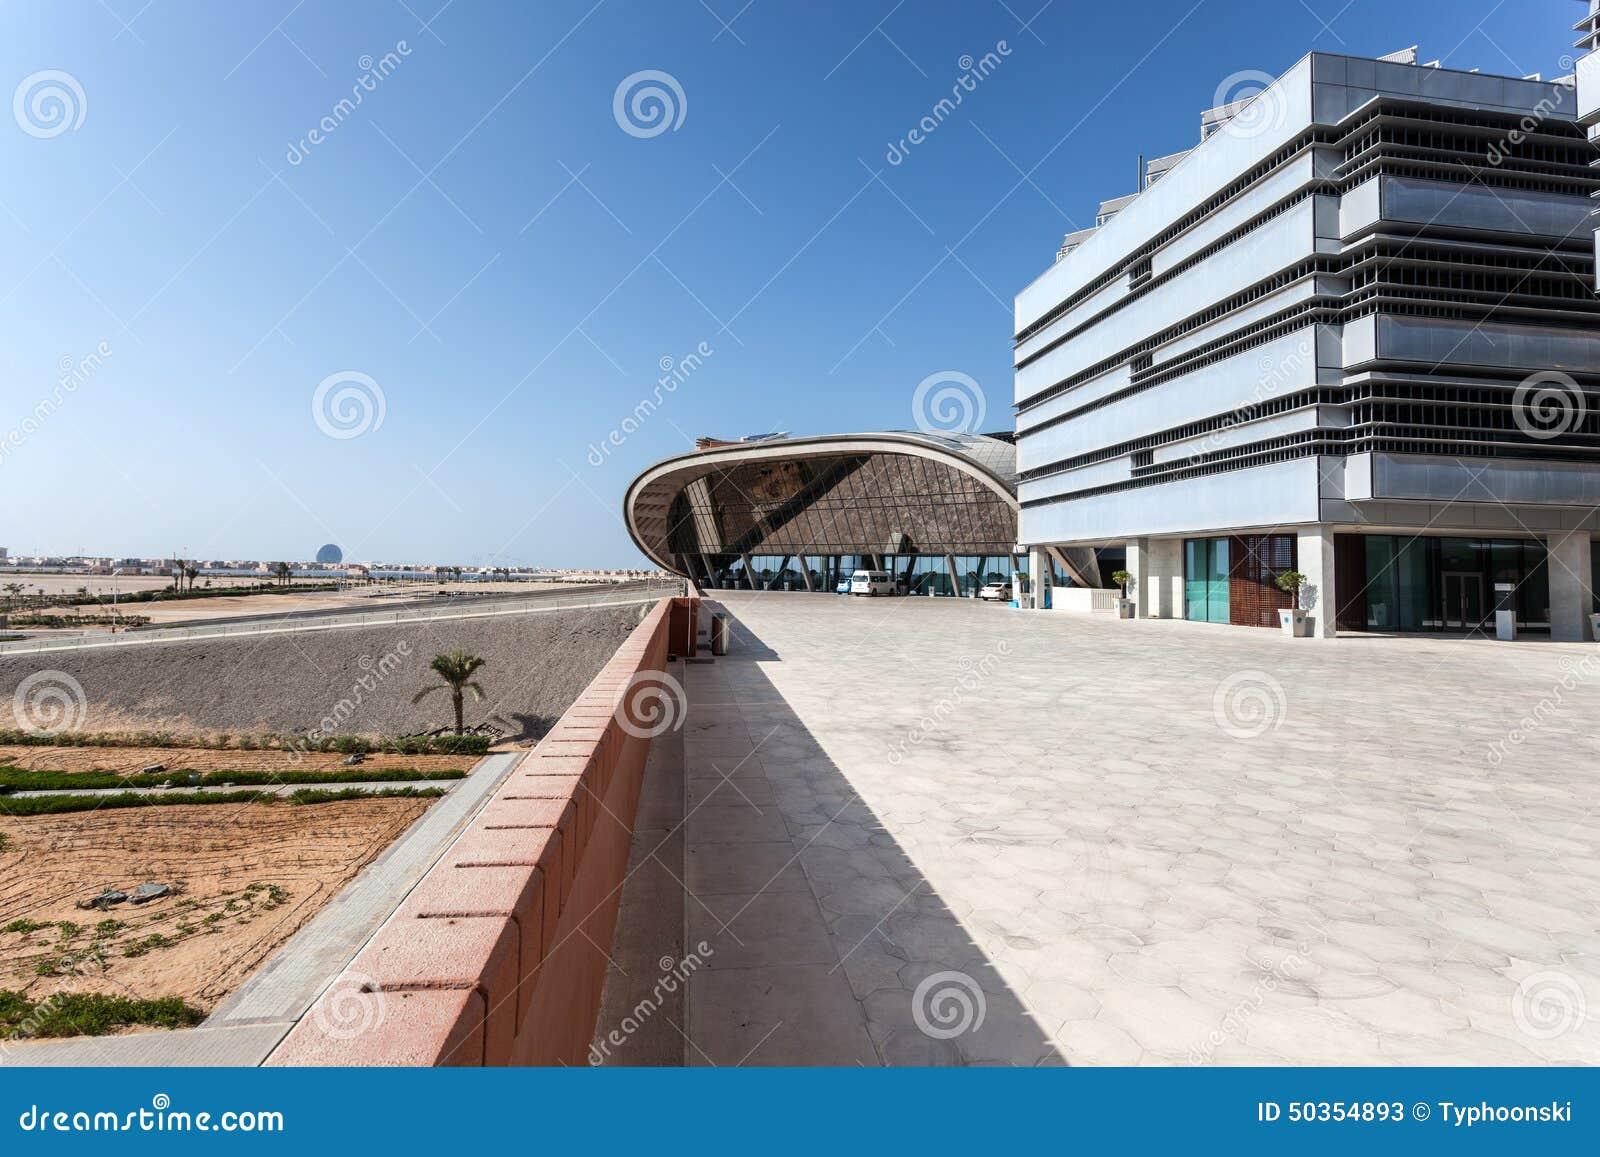 Masdar institute in abu dhabi editorial stock photo for Masdar abu dhabi